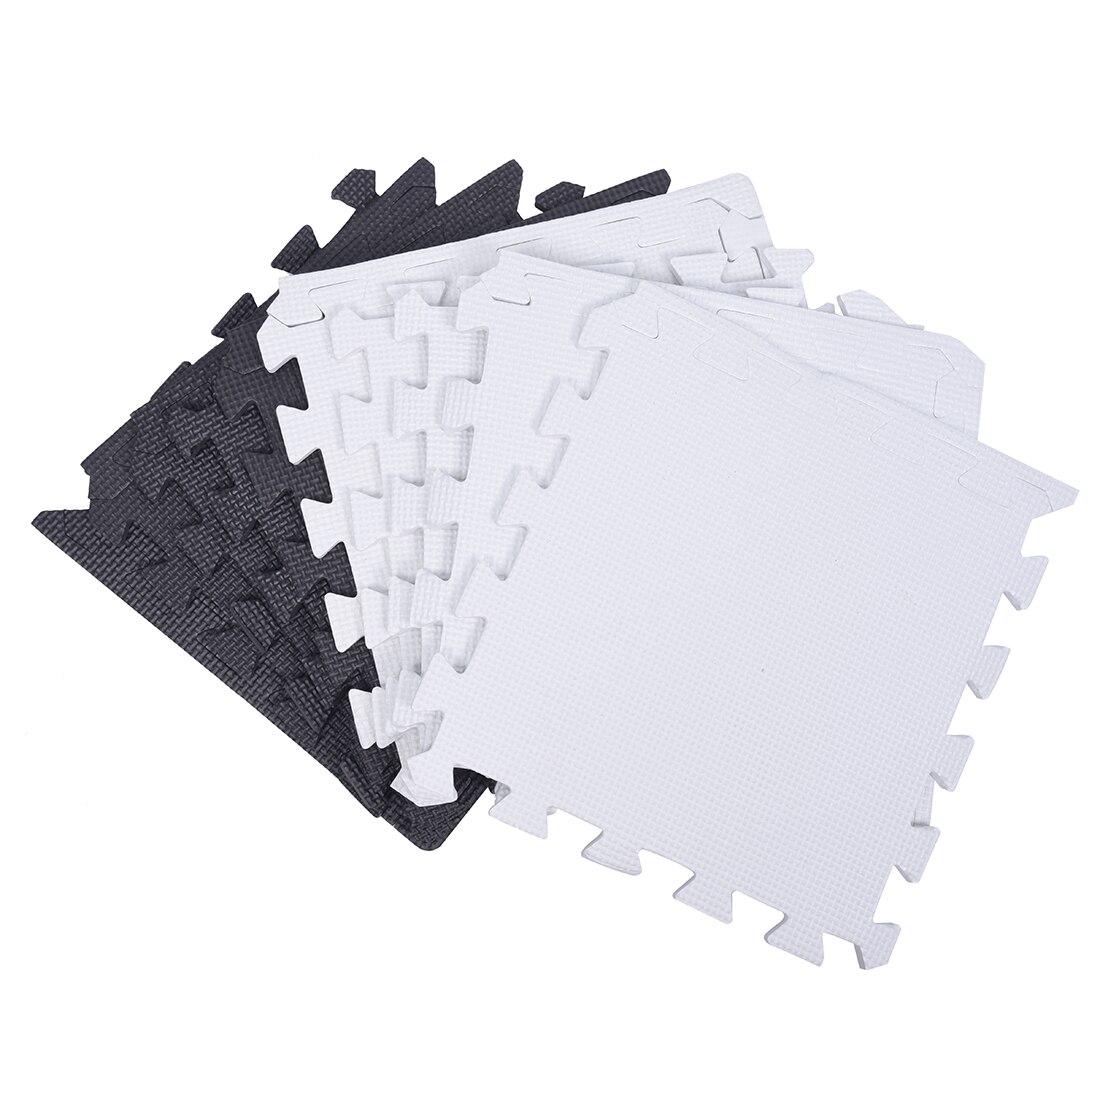 Interlocking Kitchen Floor Tiles Popular Interlocking Floor Tile Buy Cheap Interlocking Floor Tile